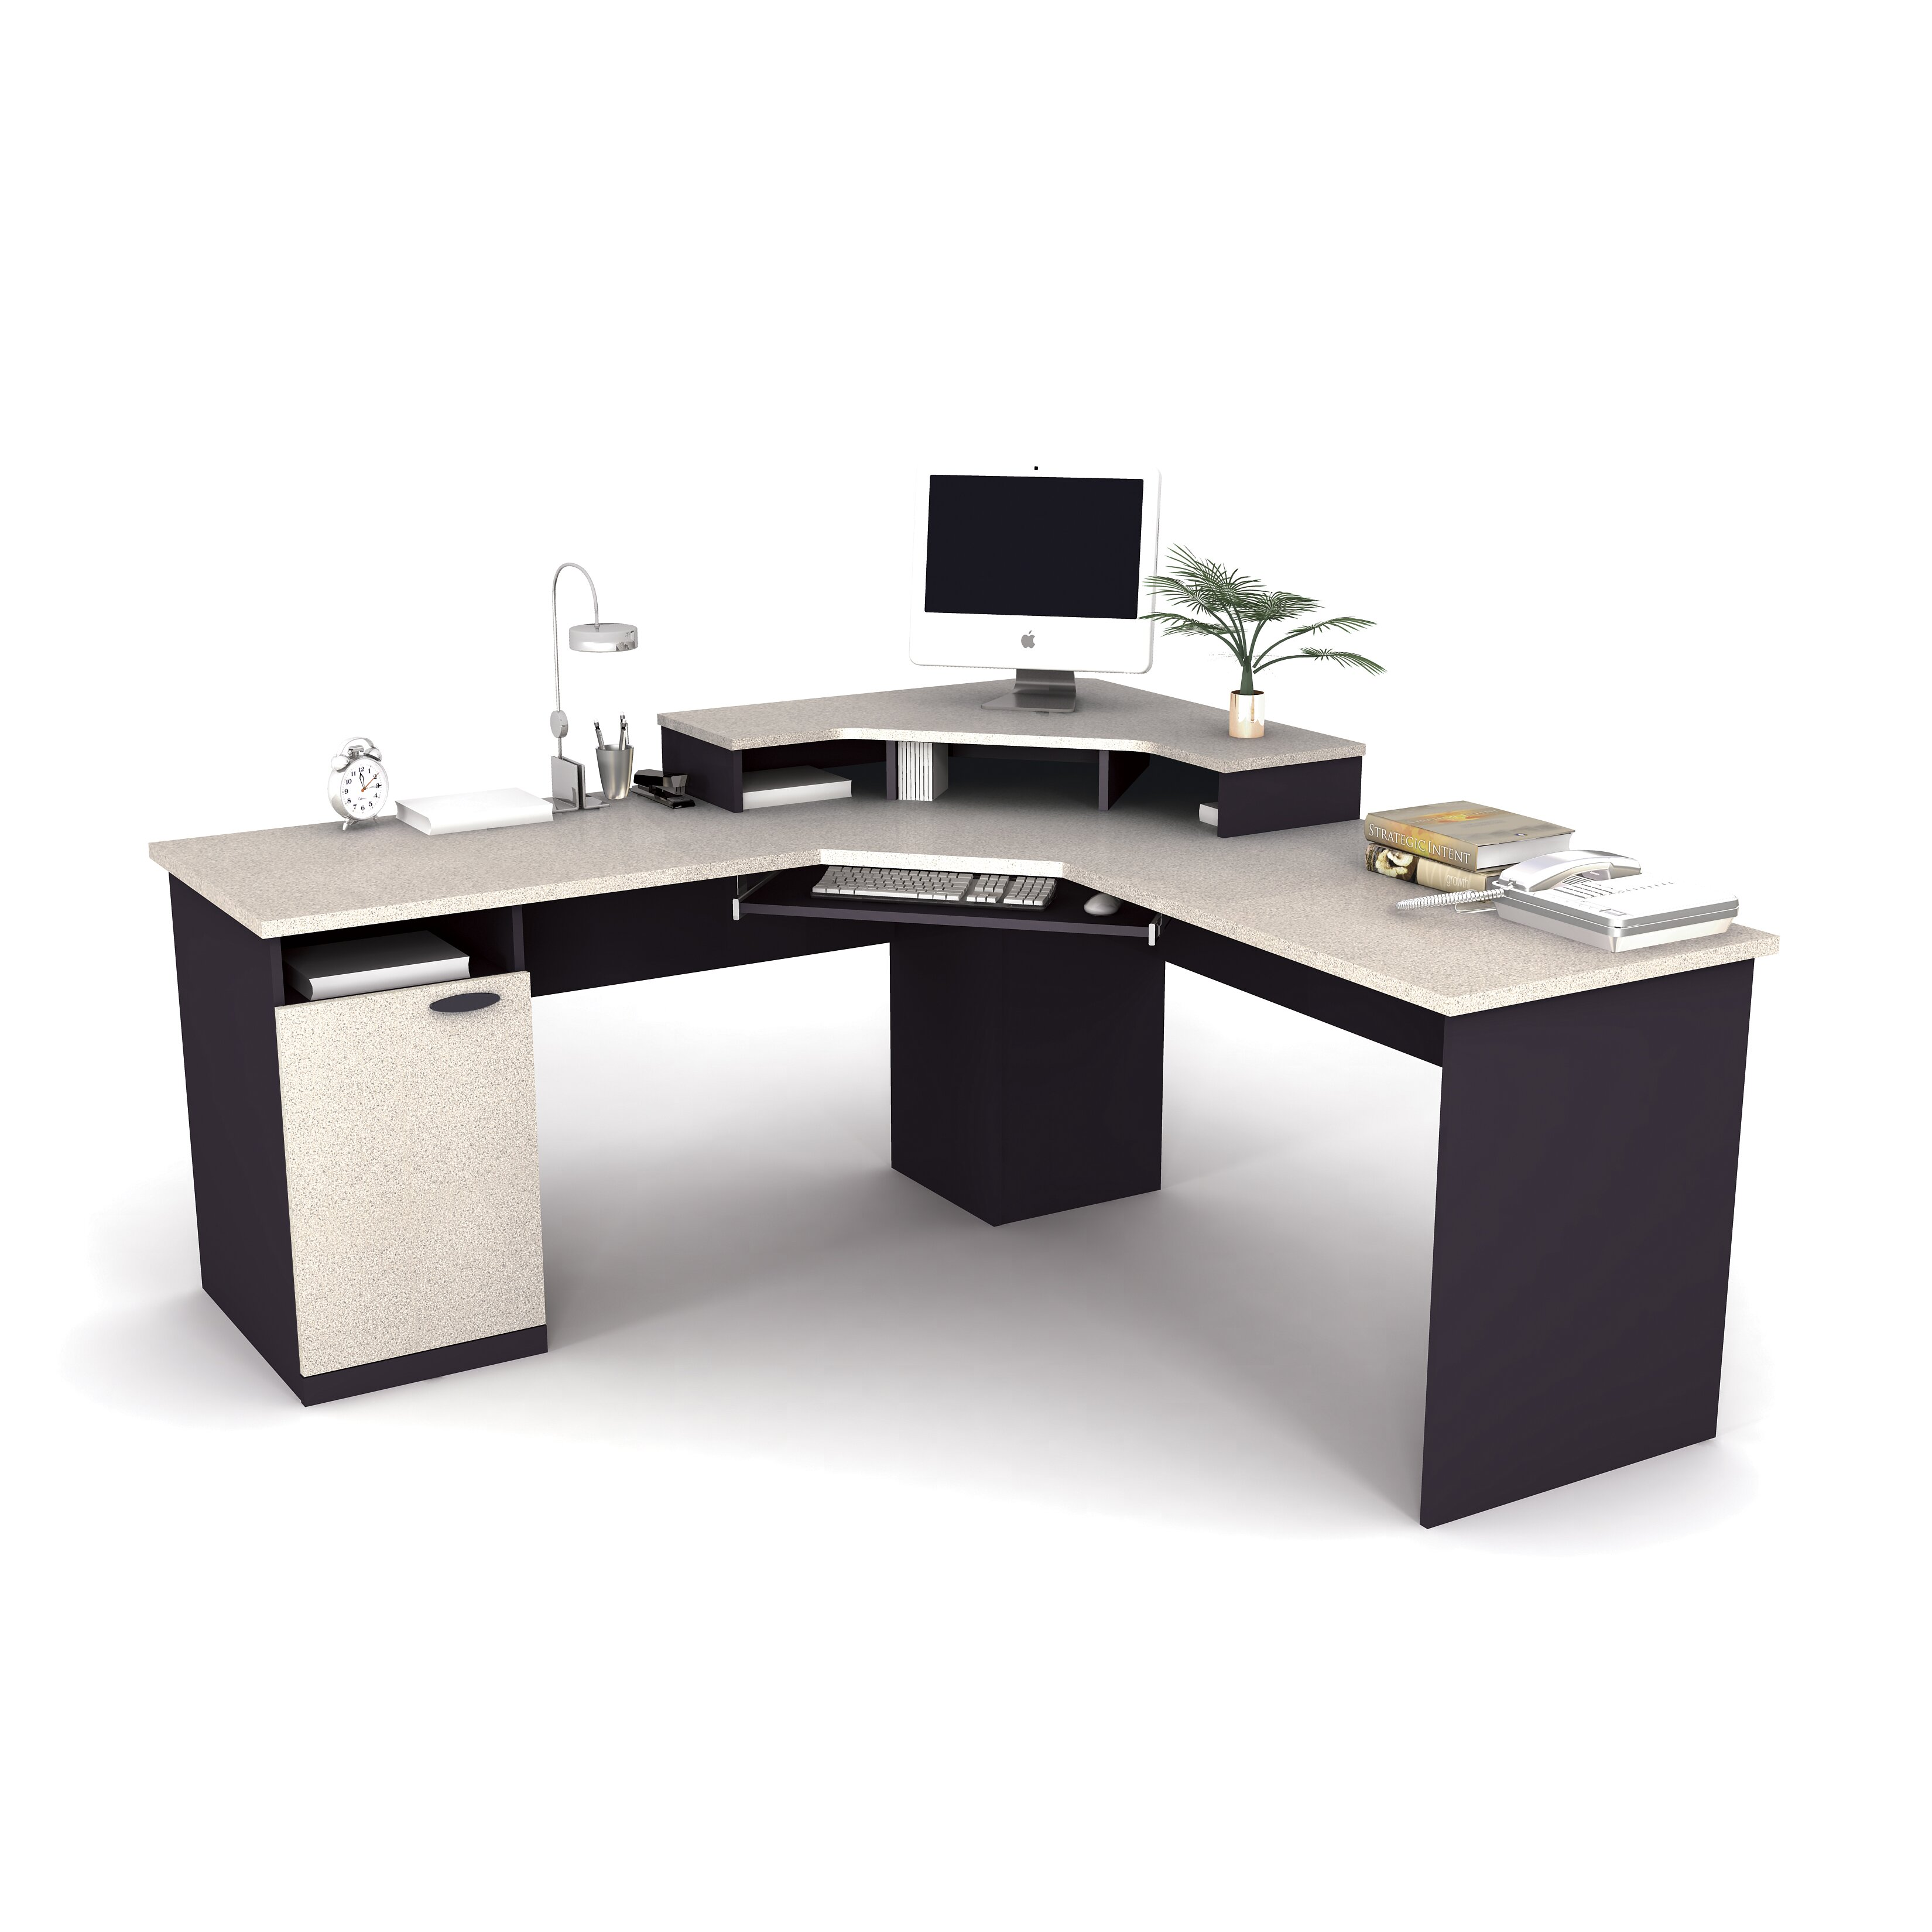 Bestar Hampton Computer Desk & Reviews  Wayfair. Kidney Tables. Gold Table. Half Round Accent Table. Desk Stationery. Simple Corner Desk Plans. Desk Oscillating Fan. Pool Tables. Mixer Table